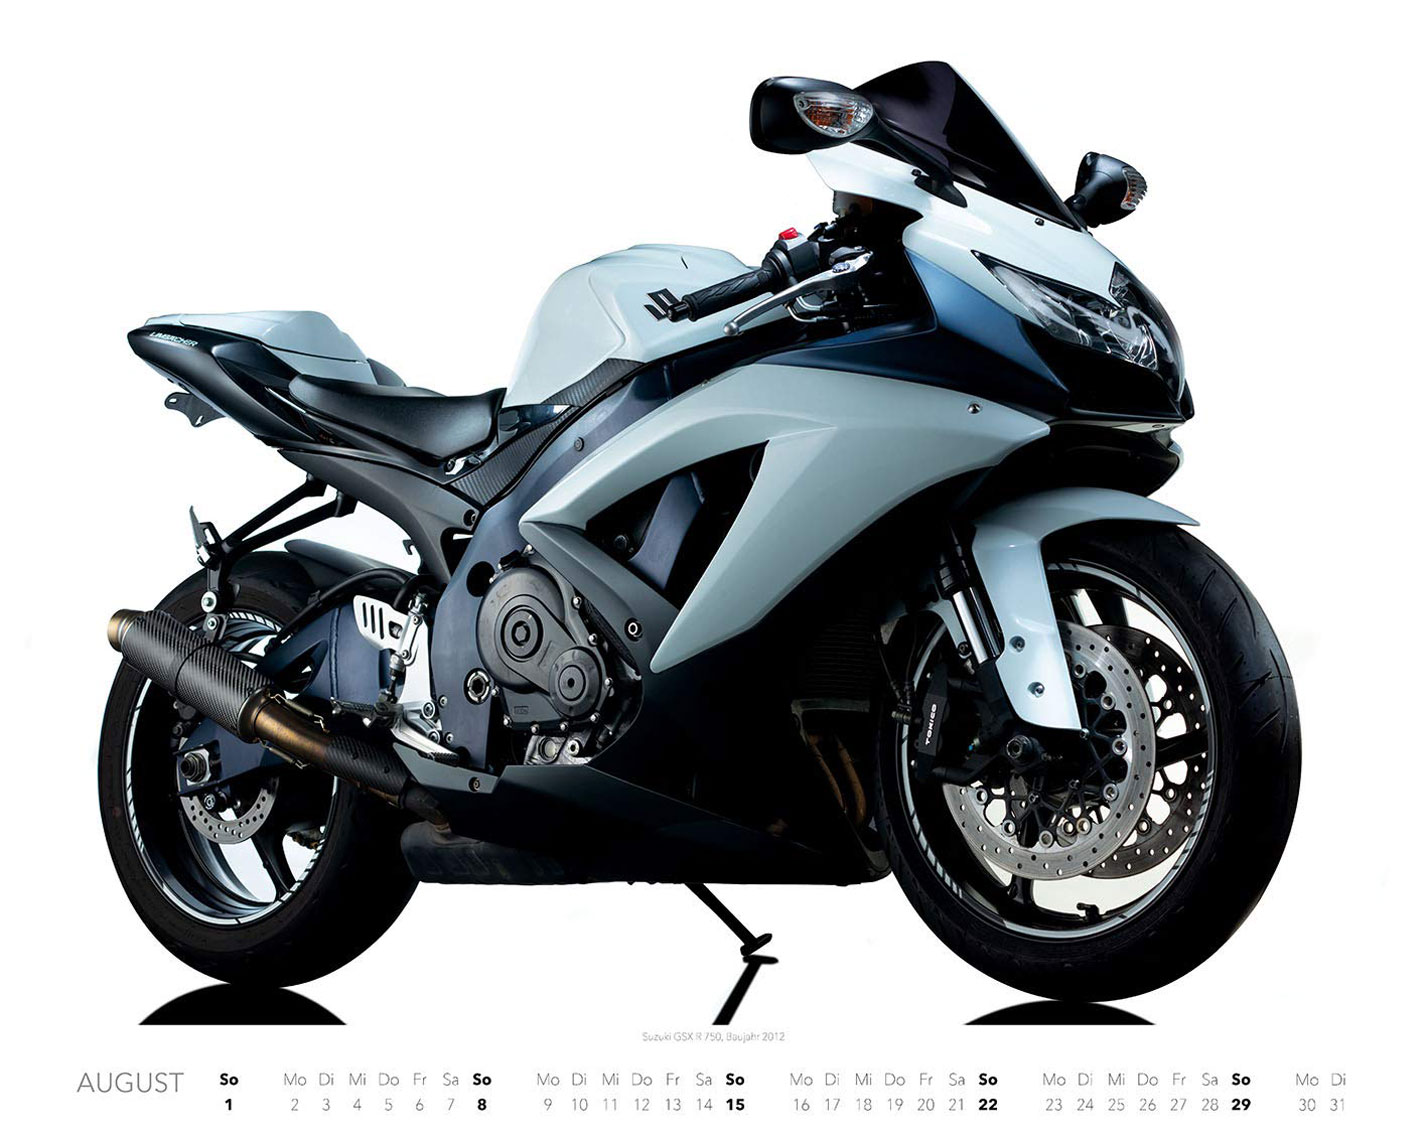 Календарь с крутыми мотоциклами на 2021 год / август